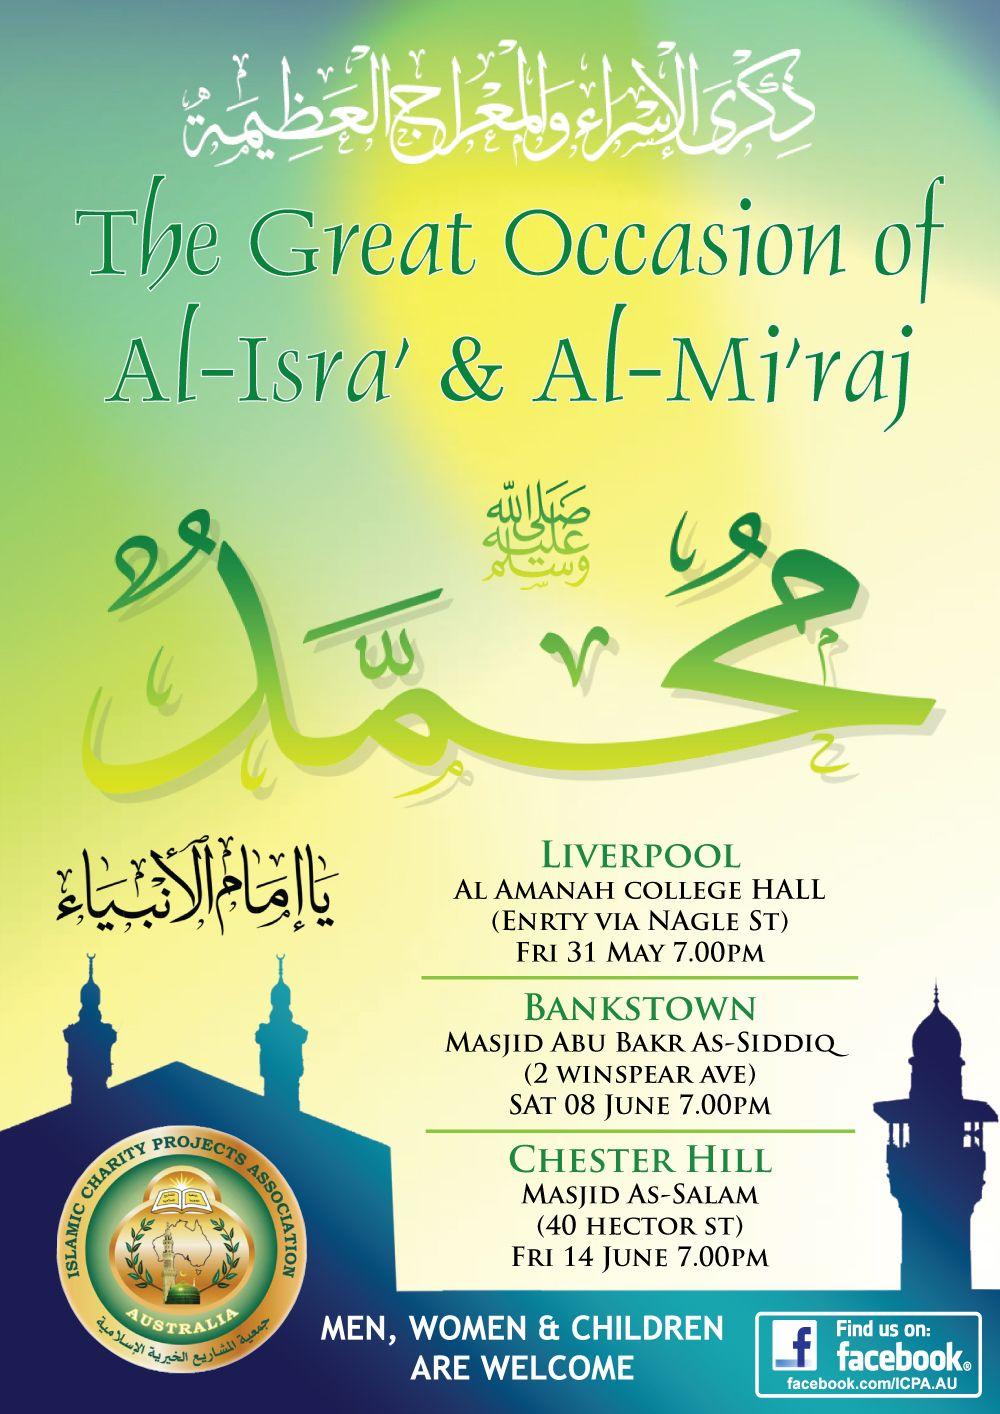 Wedding decorations muslim october 2018 Al Israu u Al Miraj Celebrations in Sydney  Events  Pinterest